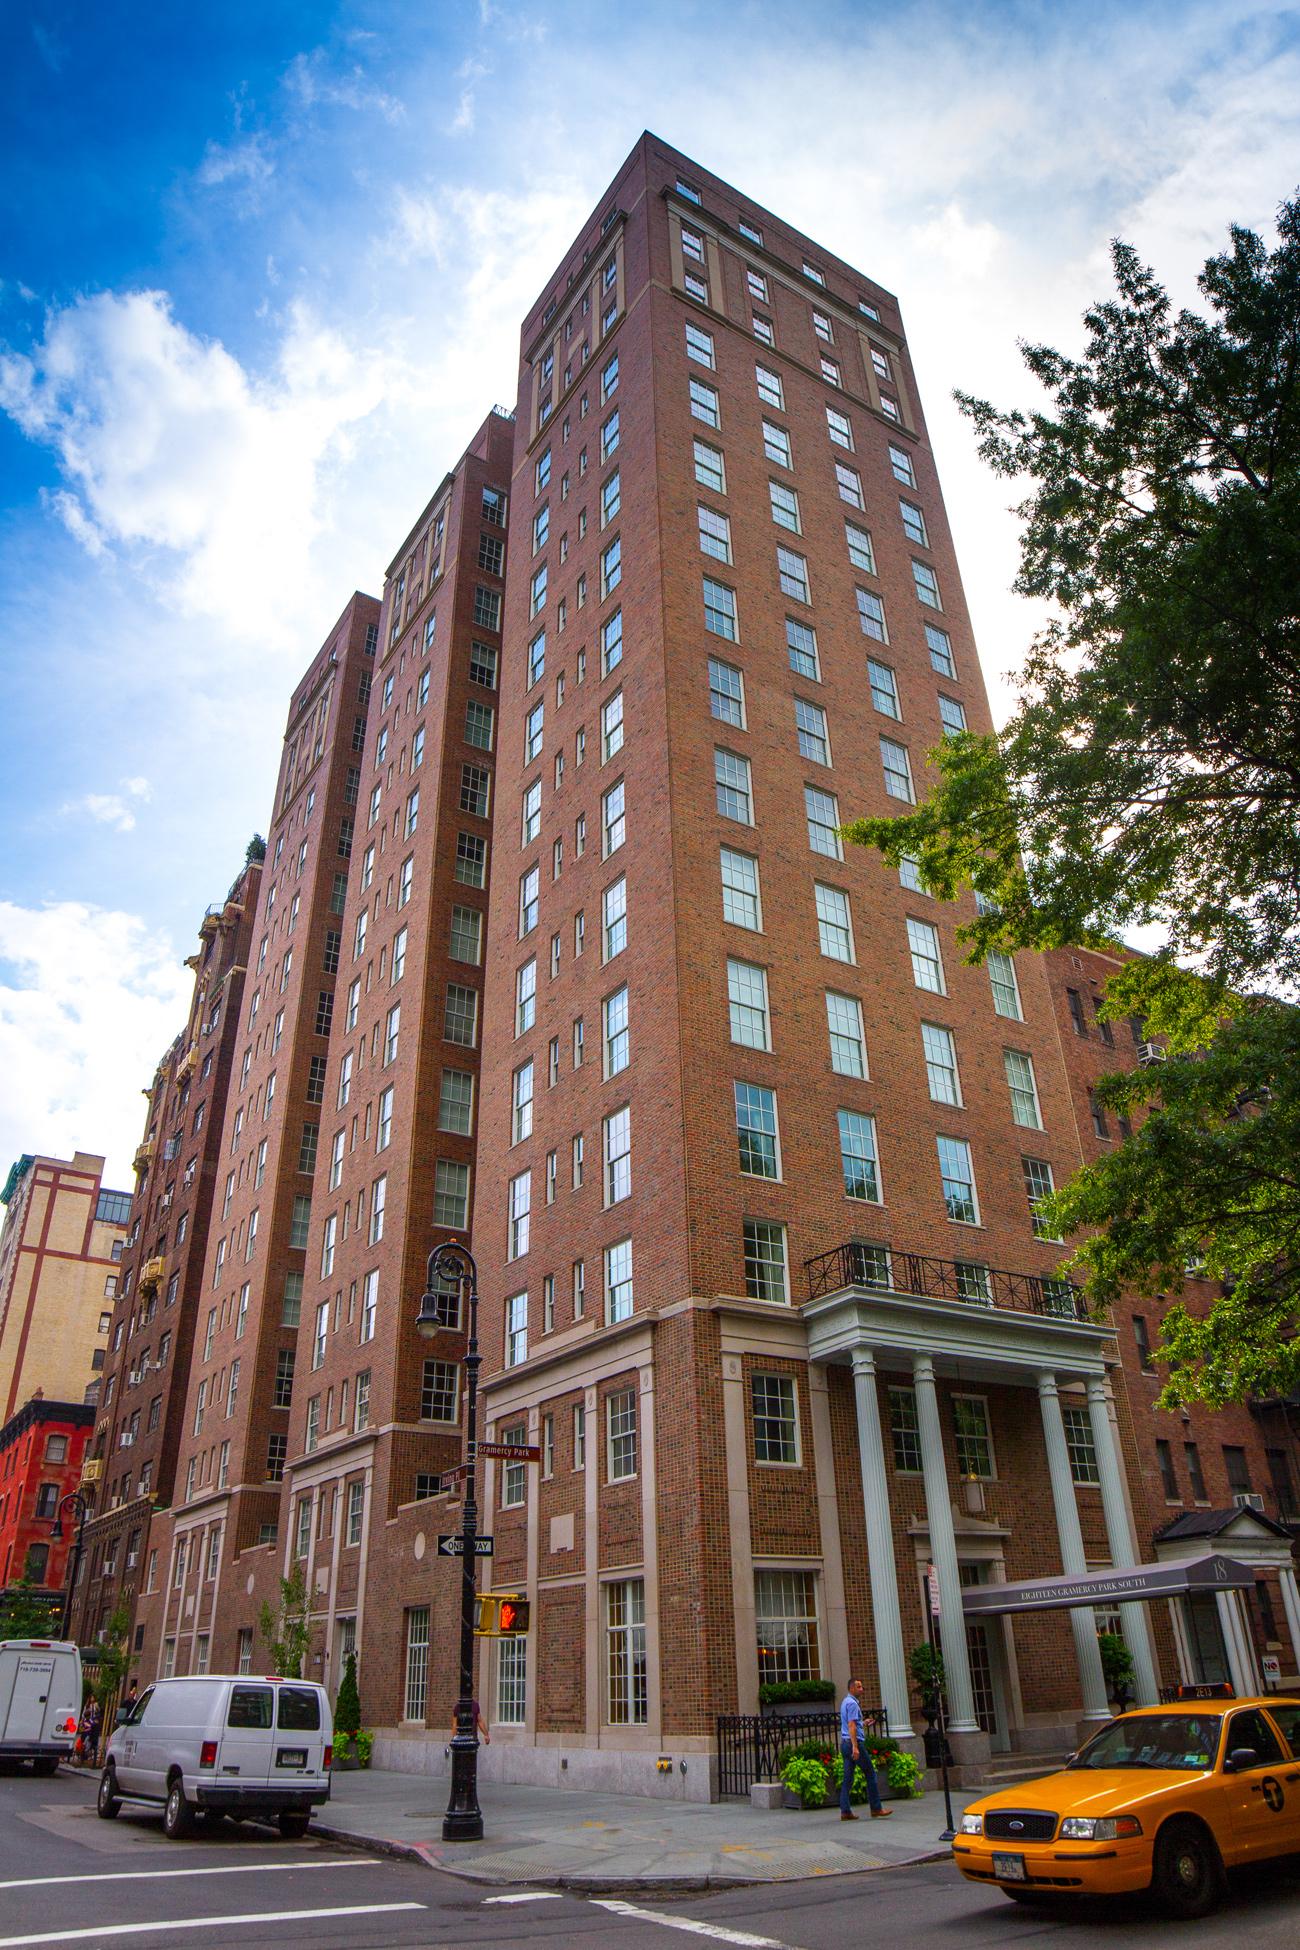 18 Gramercy Park South